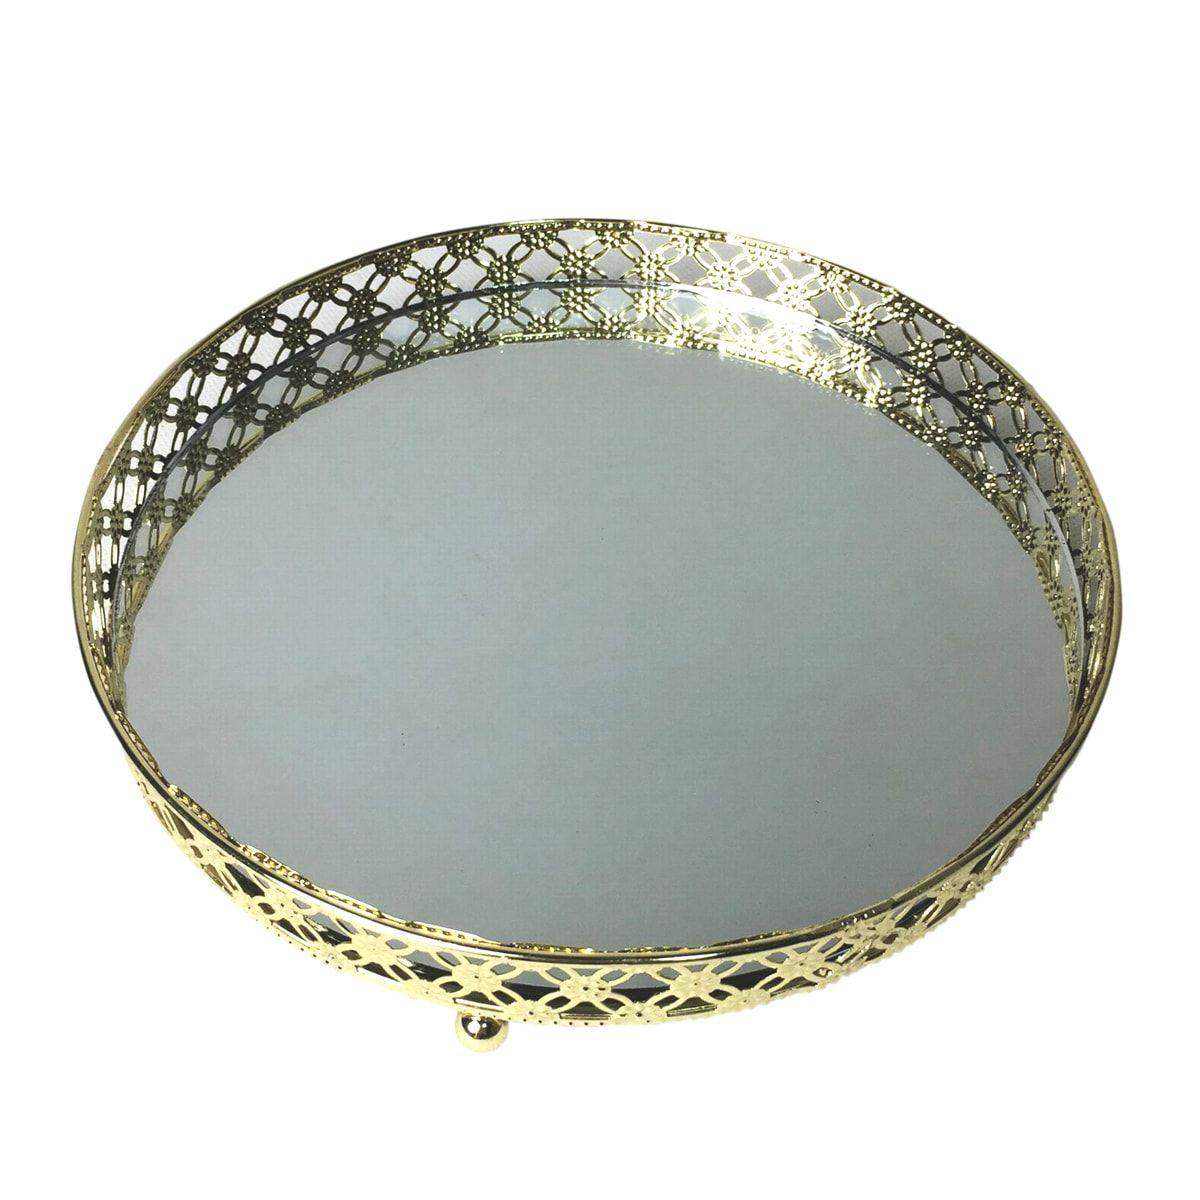 Bandeja Espelhada Dourada de Metal Redonda Luxo para Lavabo / Bar / Sala